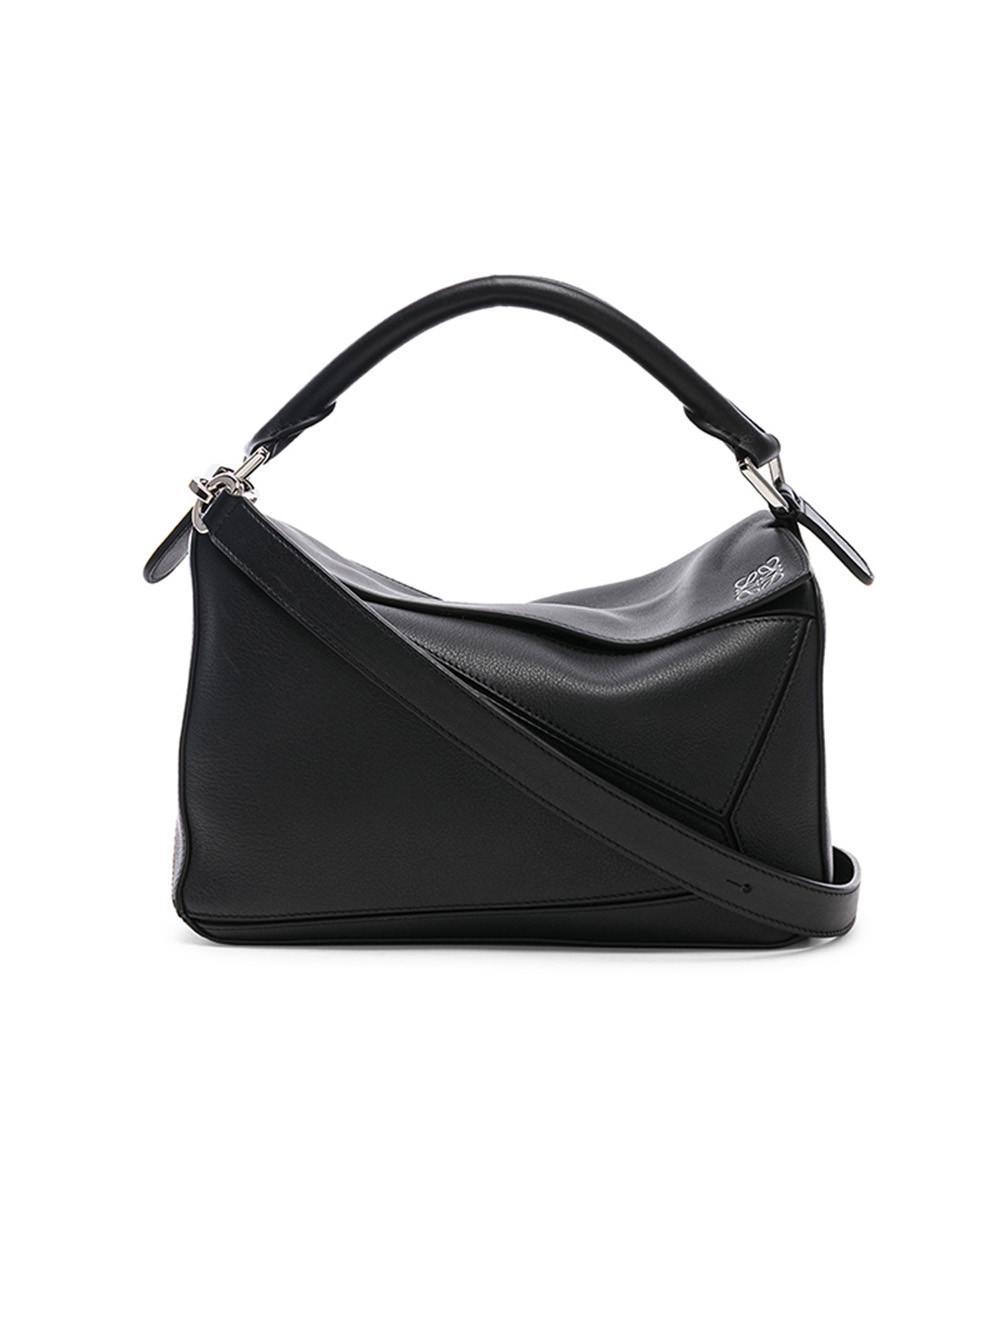 Loewe Puzzle Small Bag in Black - Lyst 292b711acf73b